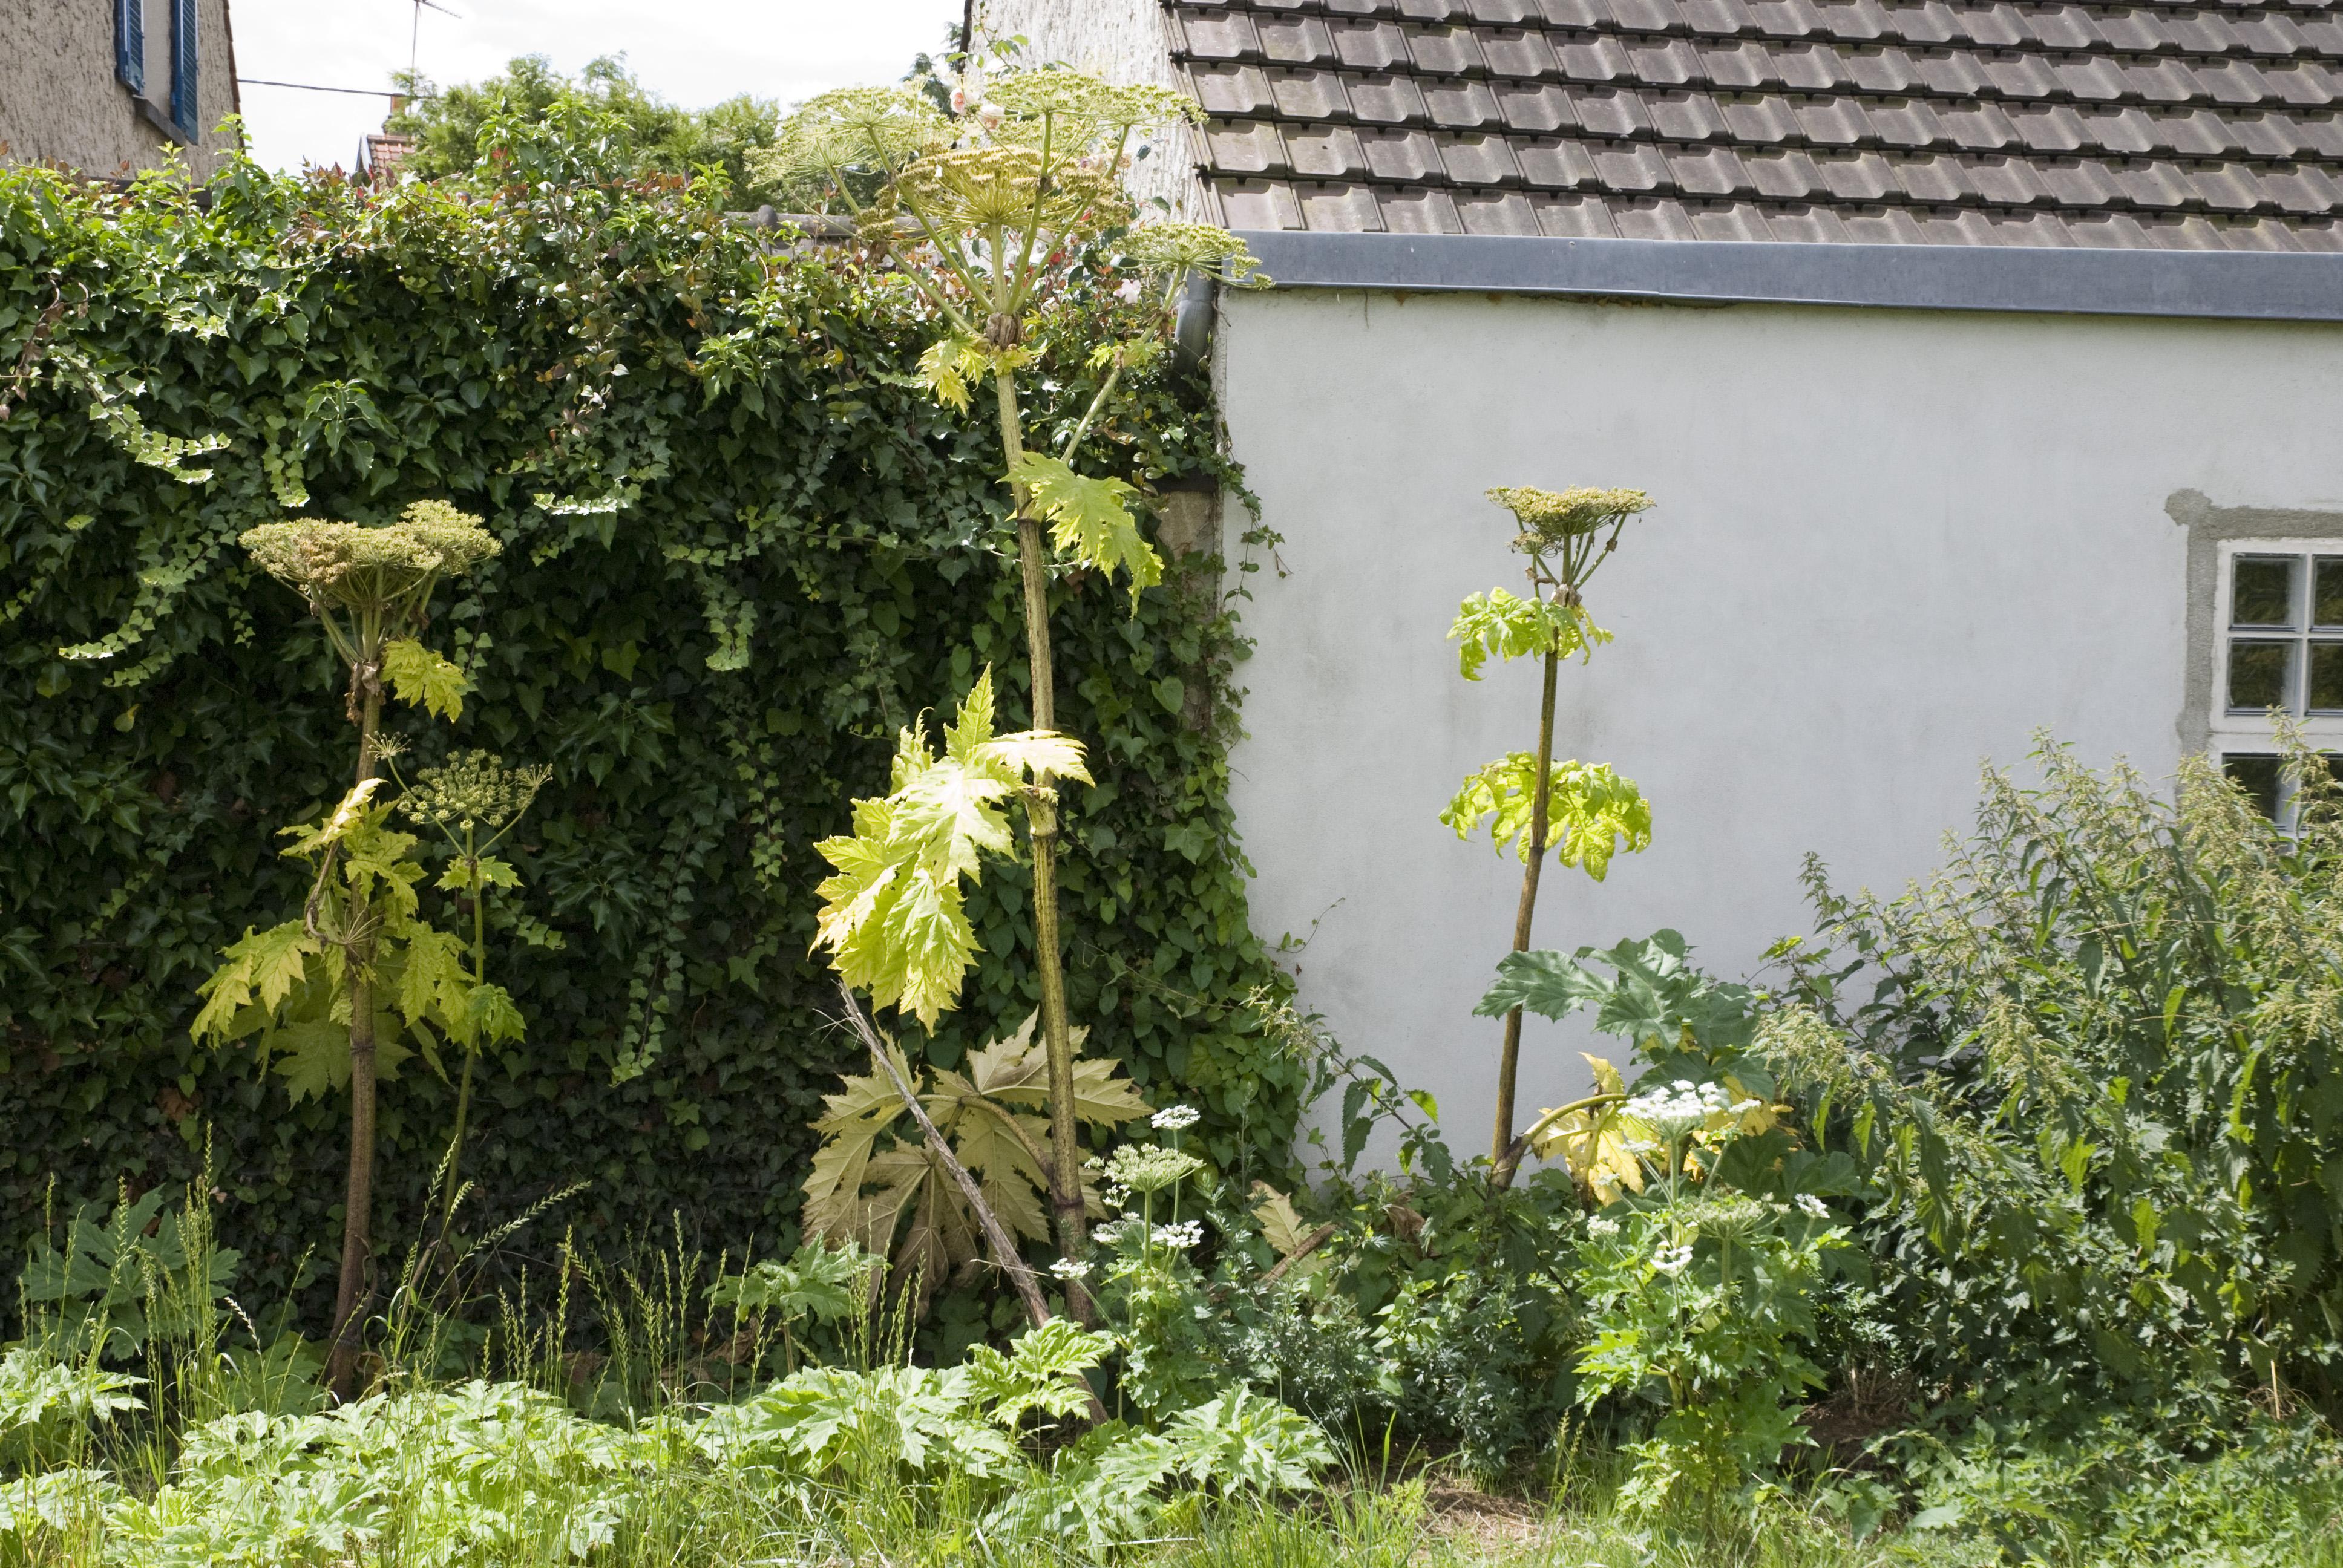 File heracleum mantegazzianum chateau thierry 02 13072008 for Bureau 02 chateau thierry